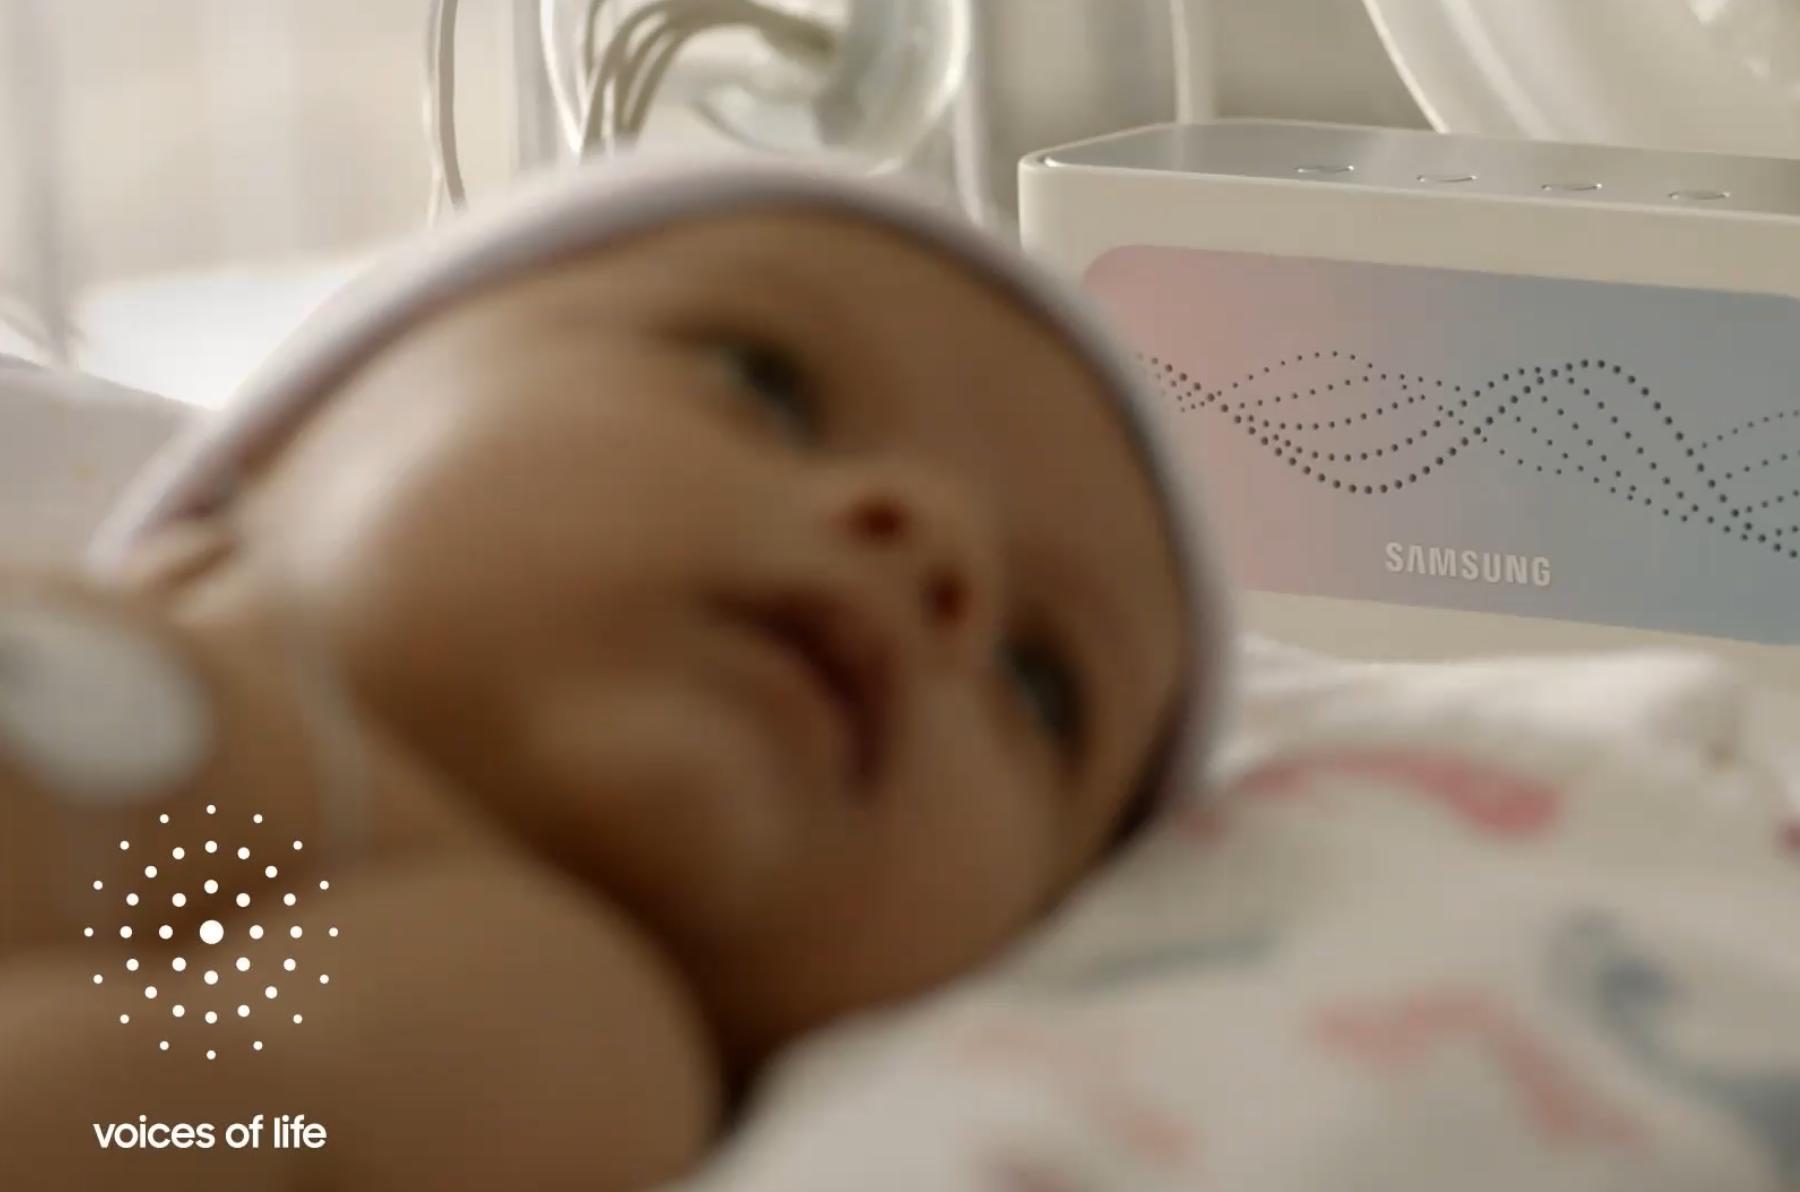 Audiense blog - Samsung | Voice of Life